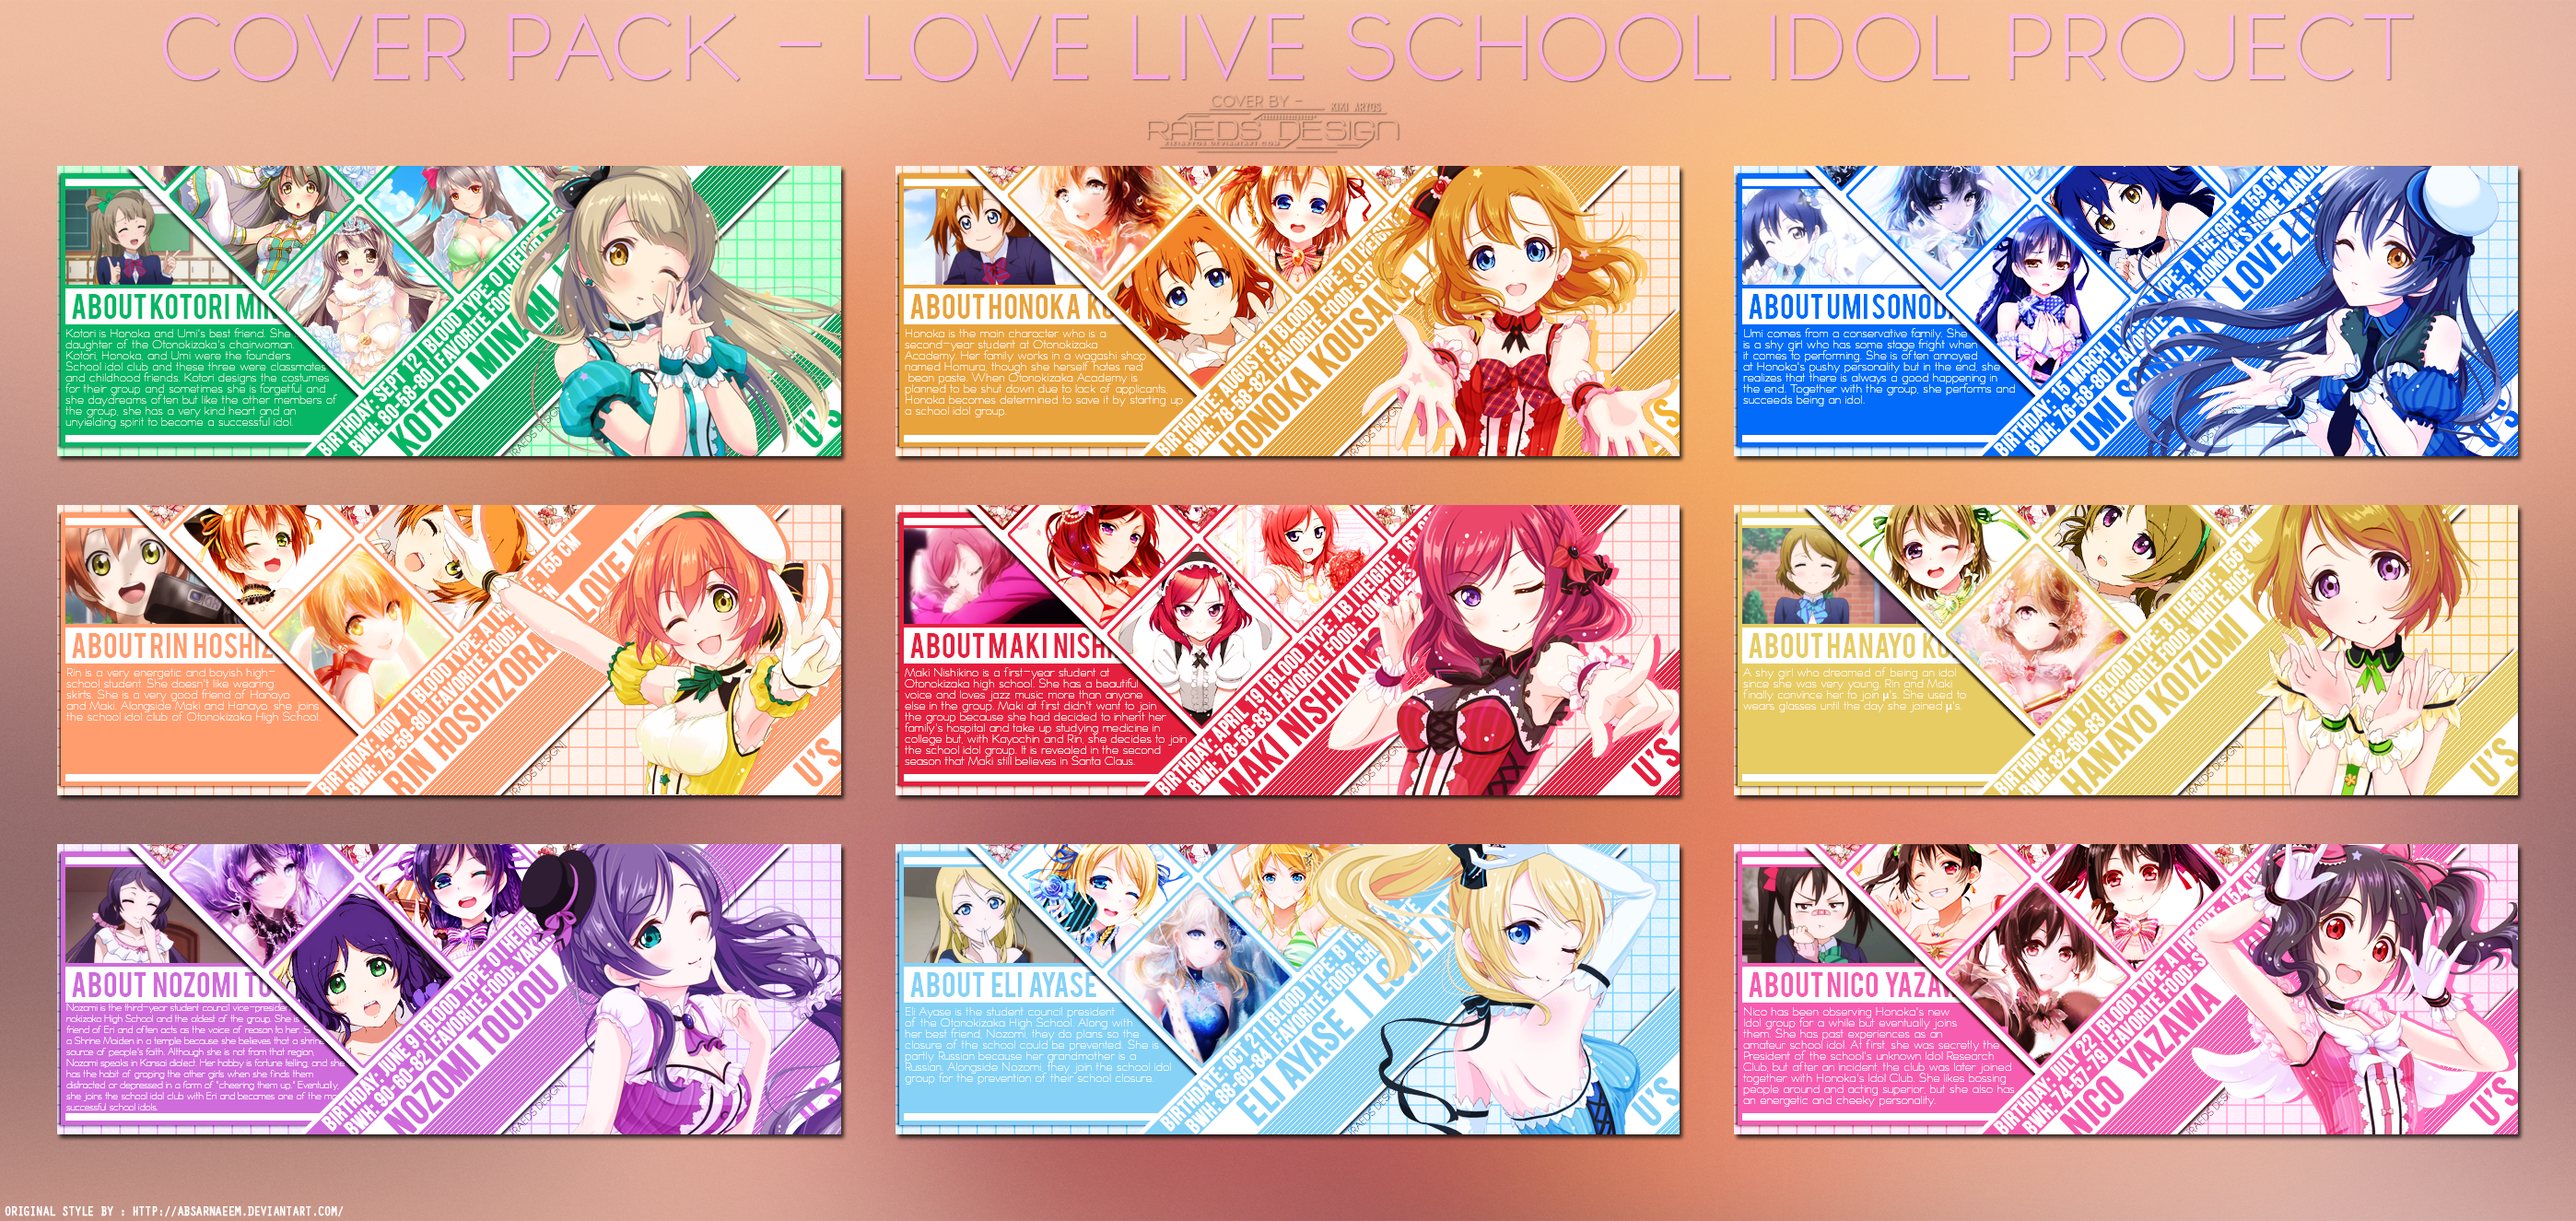 Love Live School Idol Project By Kikiaryos On